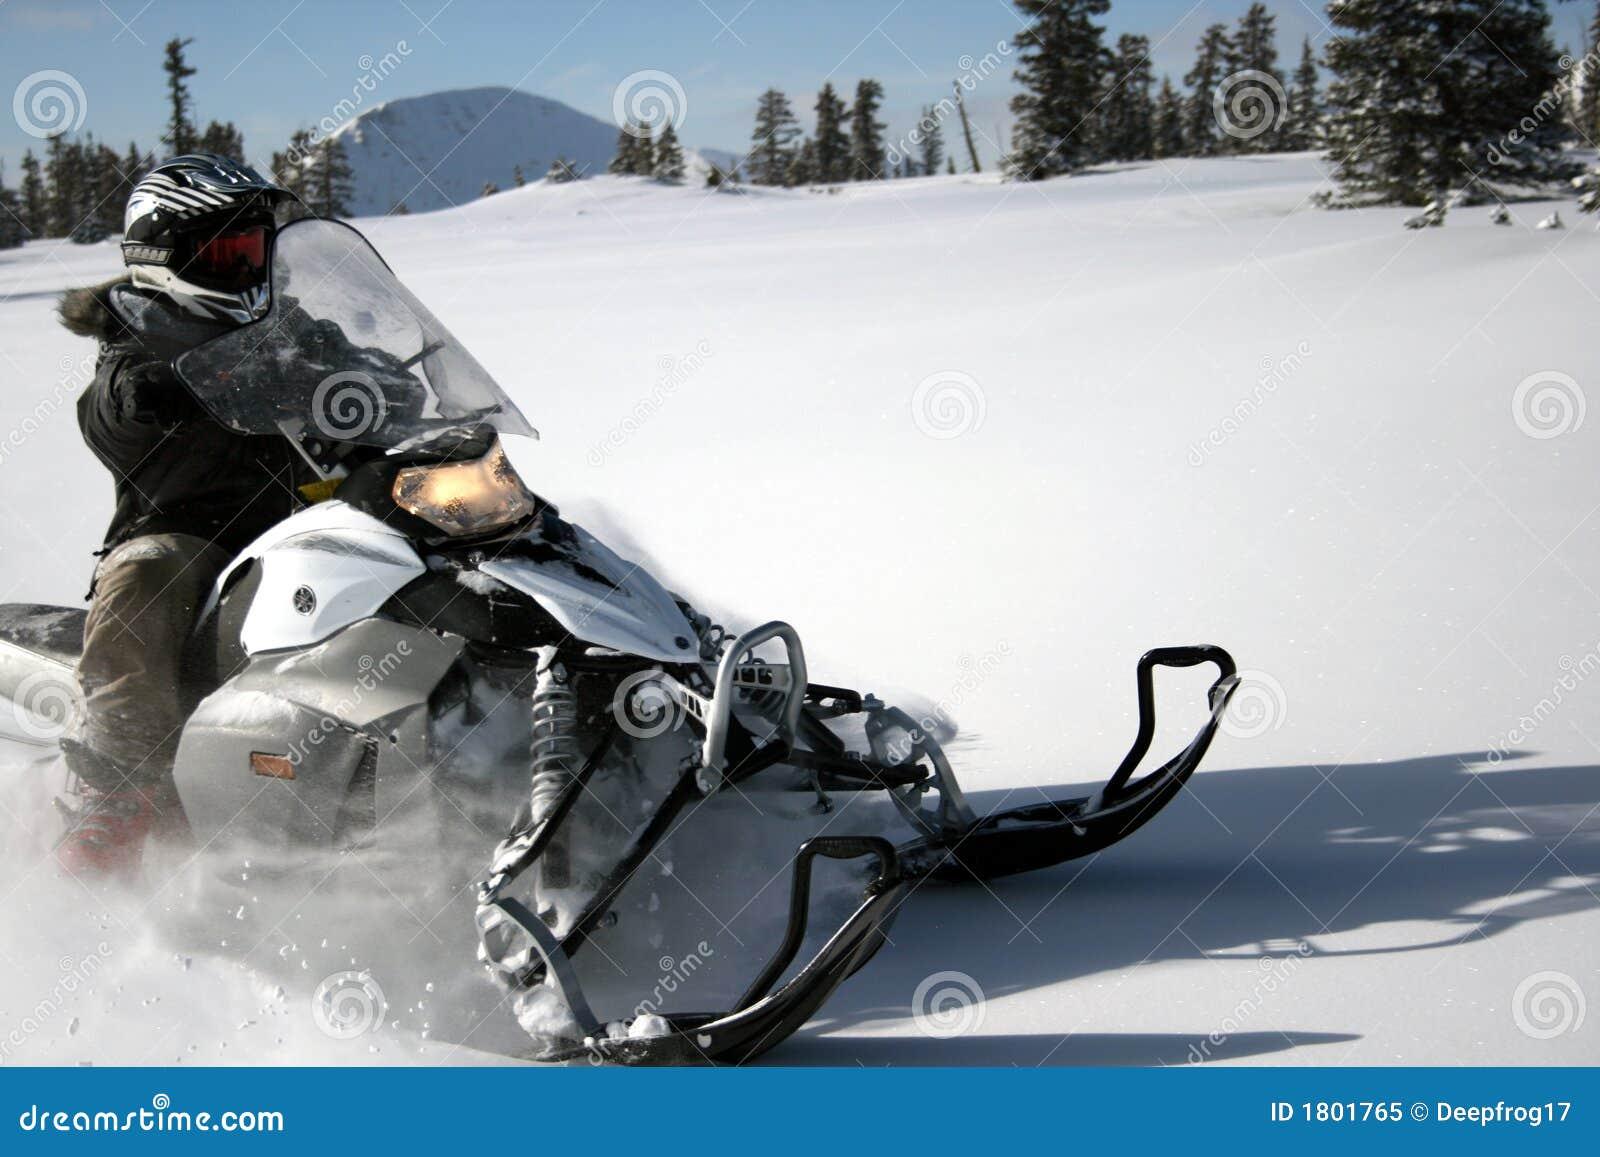 snow machine or snowmobile